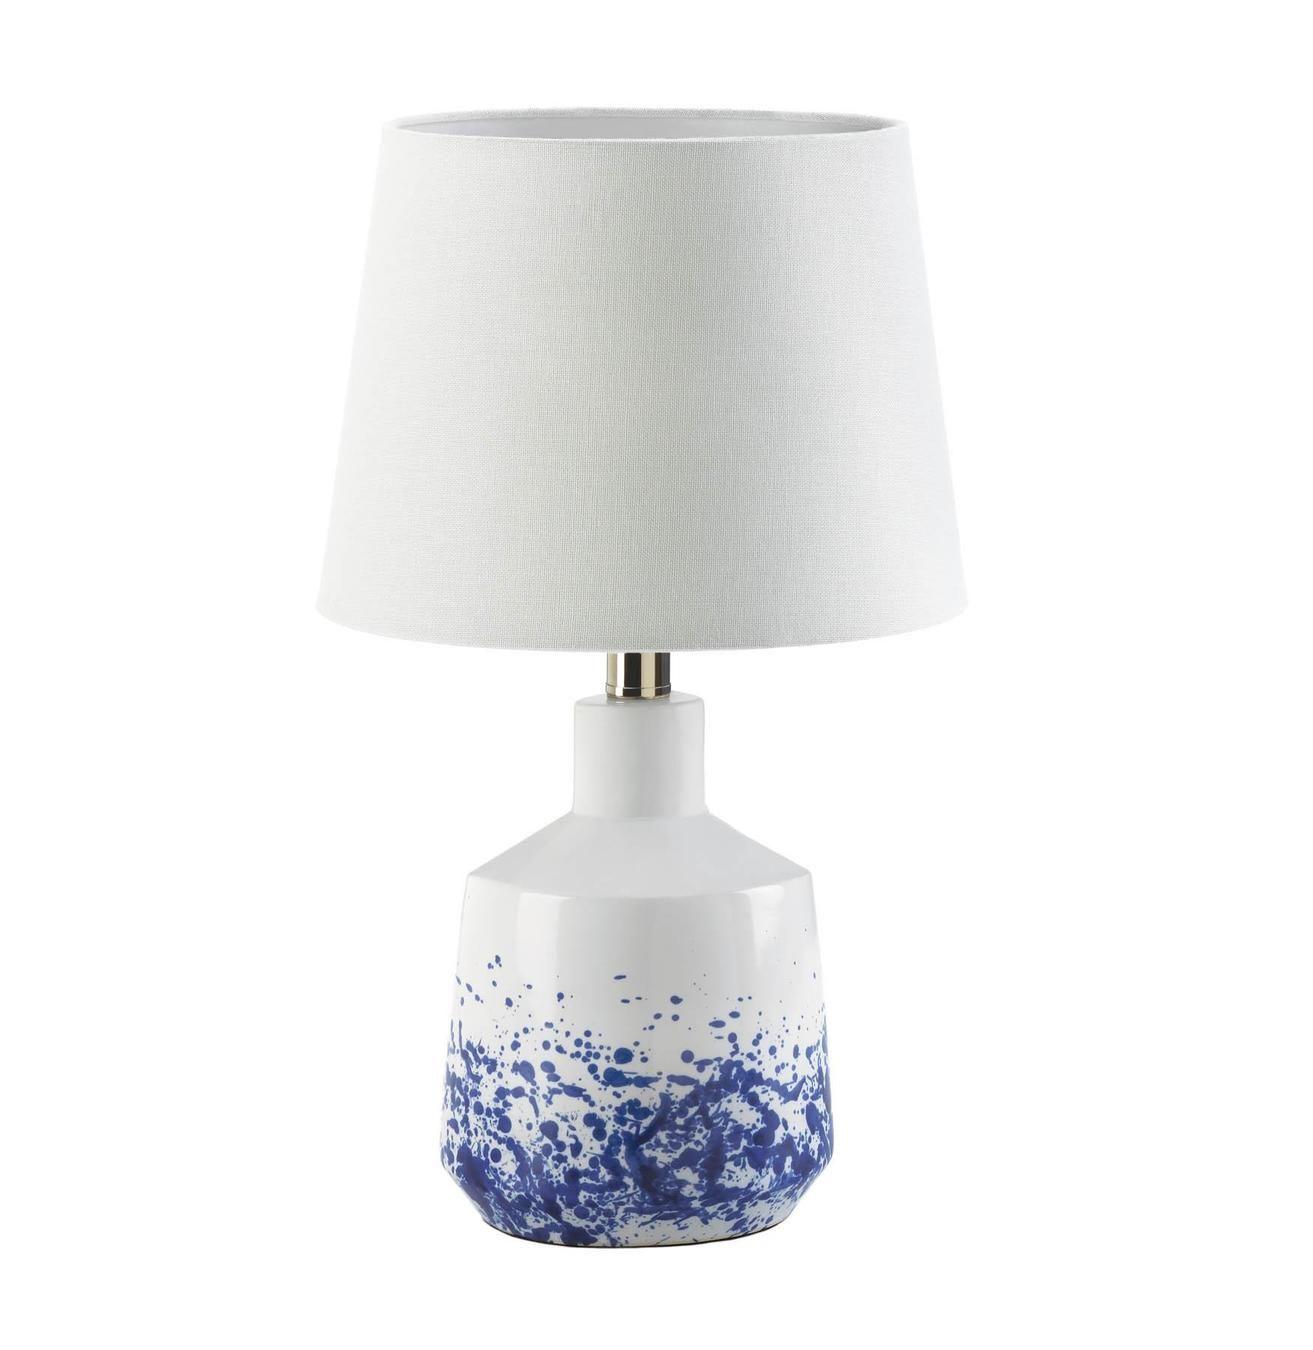 White Blue Splash Table Lamp In 2021 Table Lamp Lamp White Table Lamp